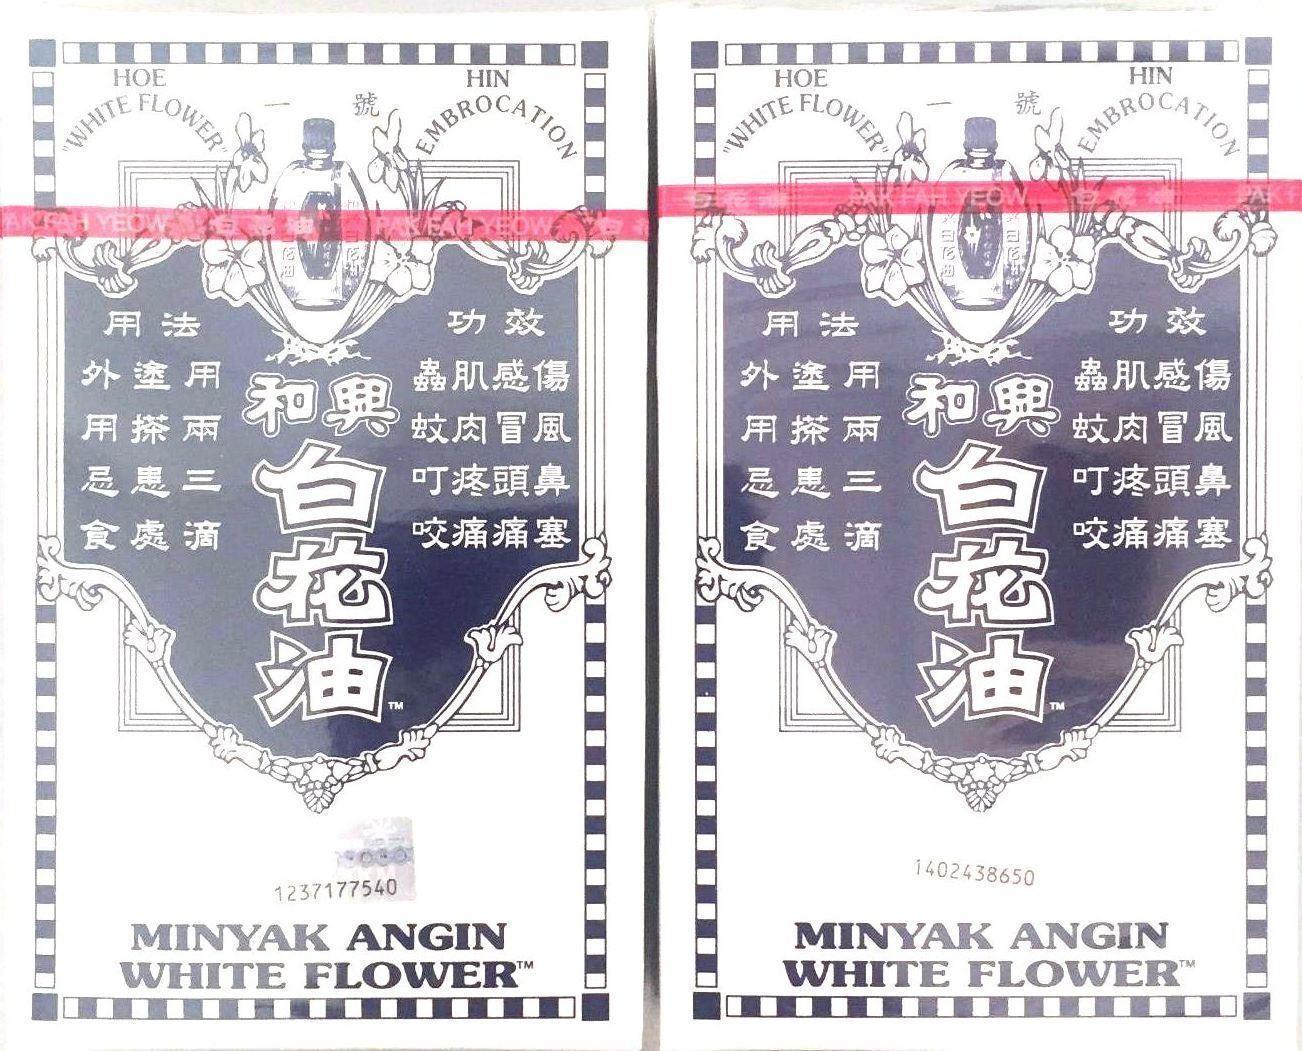 20 X 20ml White Flower Oil Hoe Hin Analgesic And 50 Similar Items